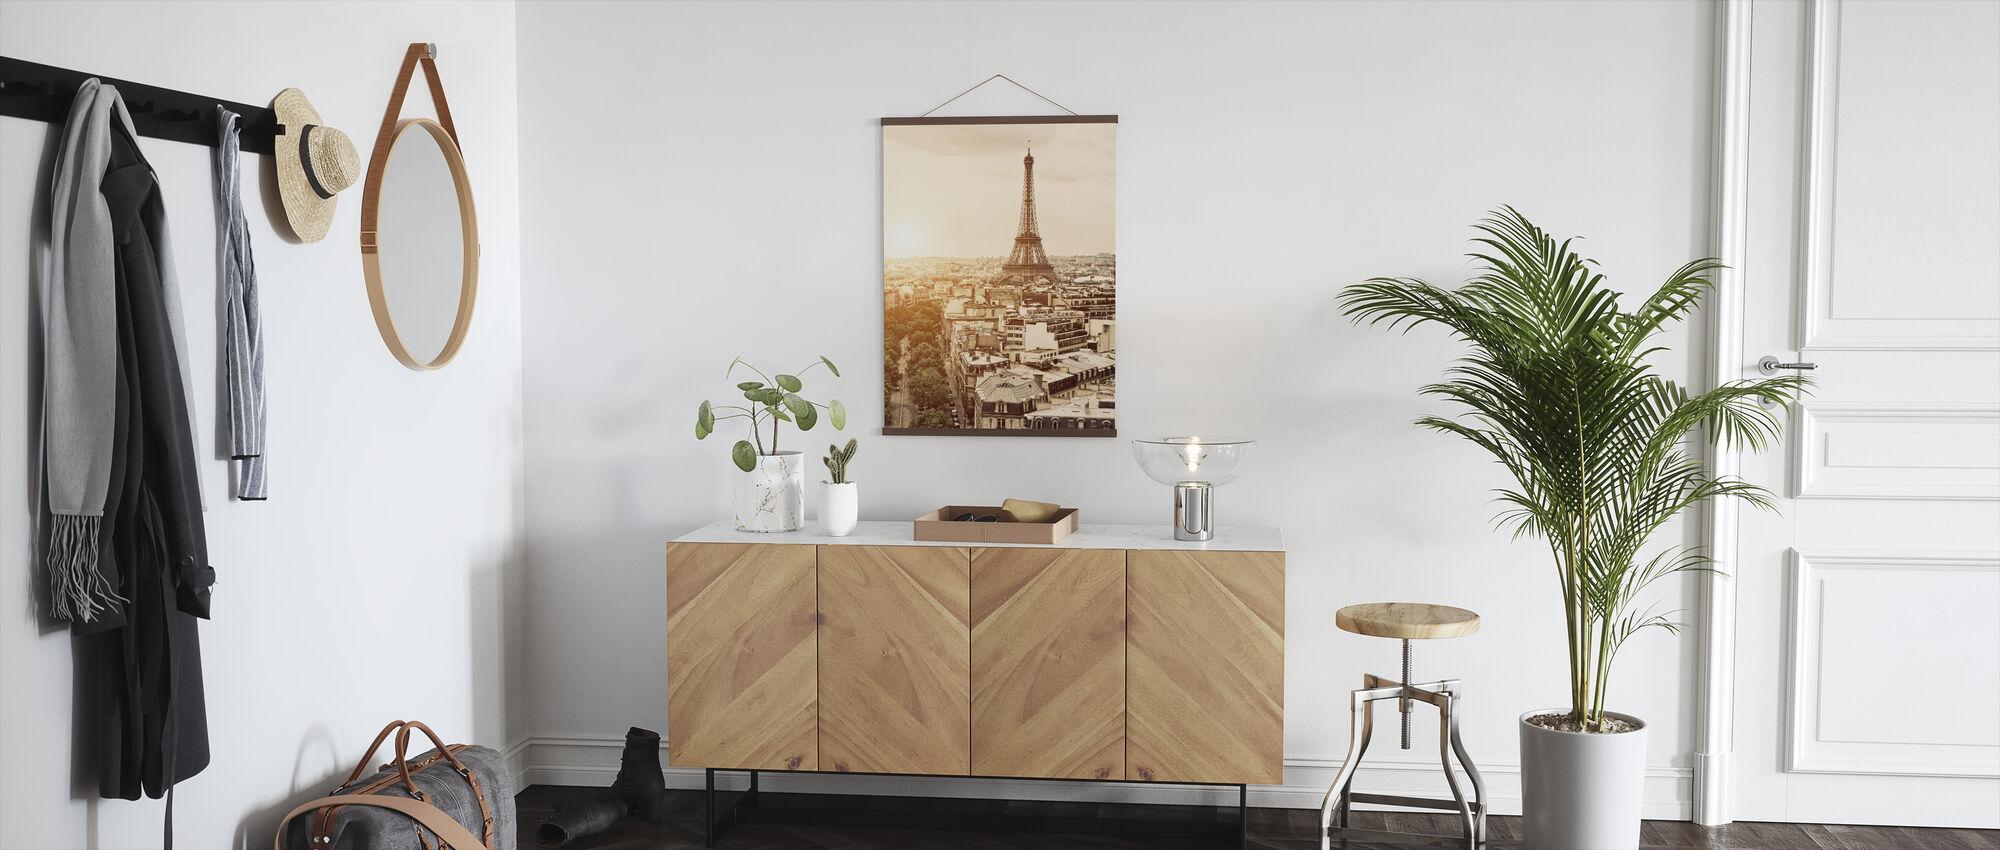 Pariisi - Eiffel-torni - Juliste - Aula